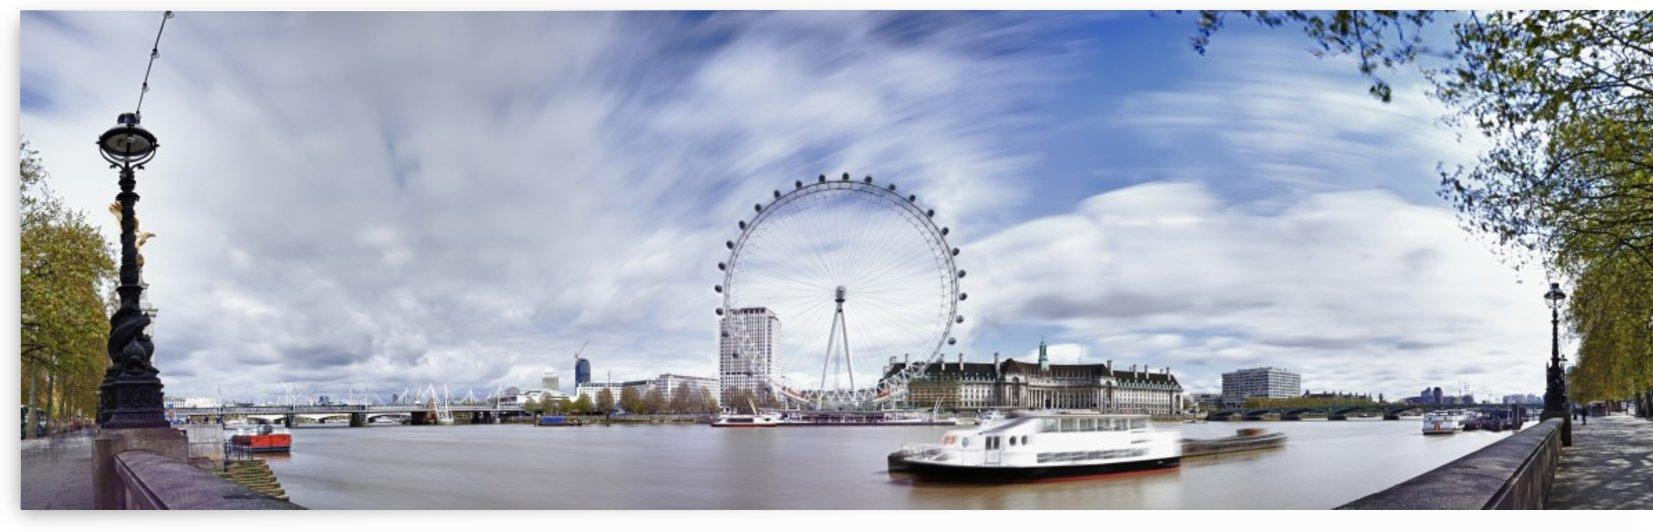 London Eye by Adrian Brockwell